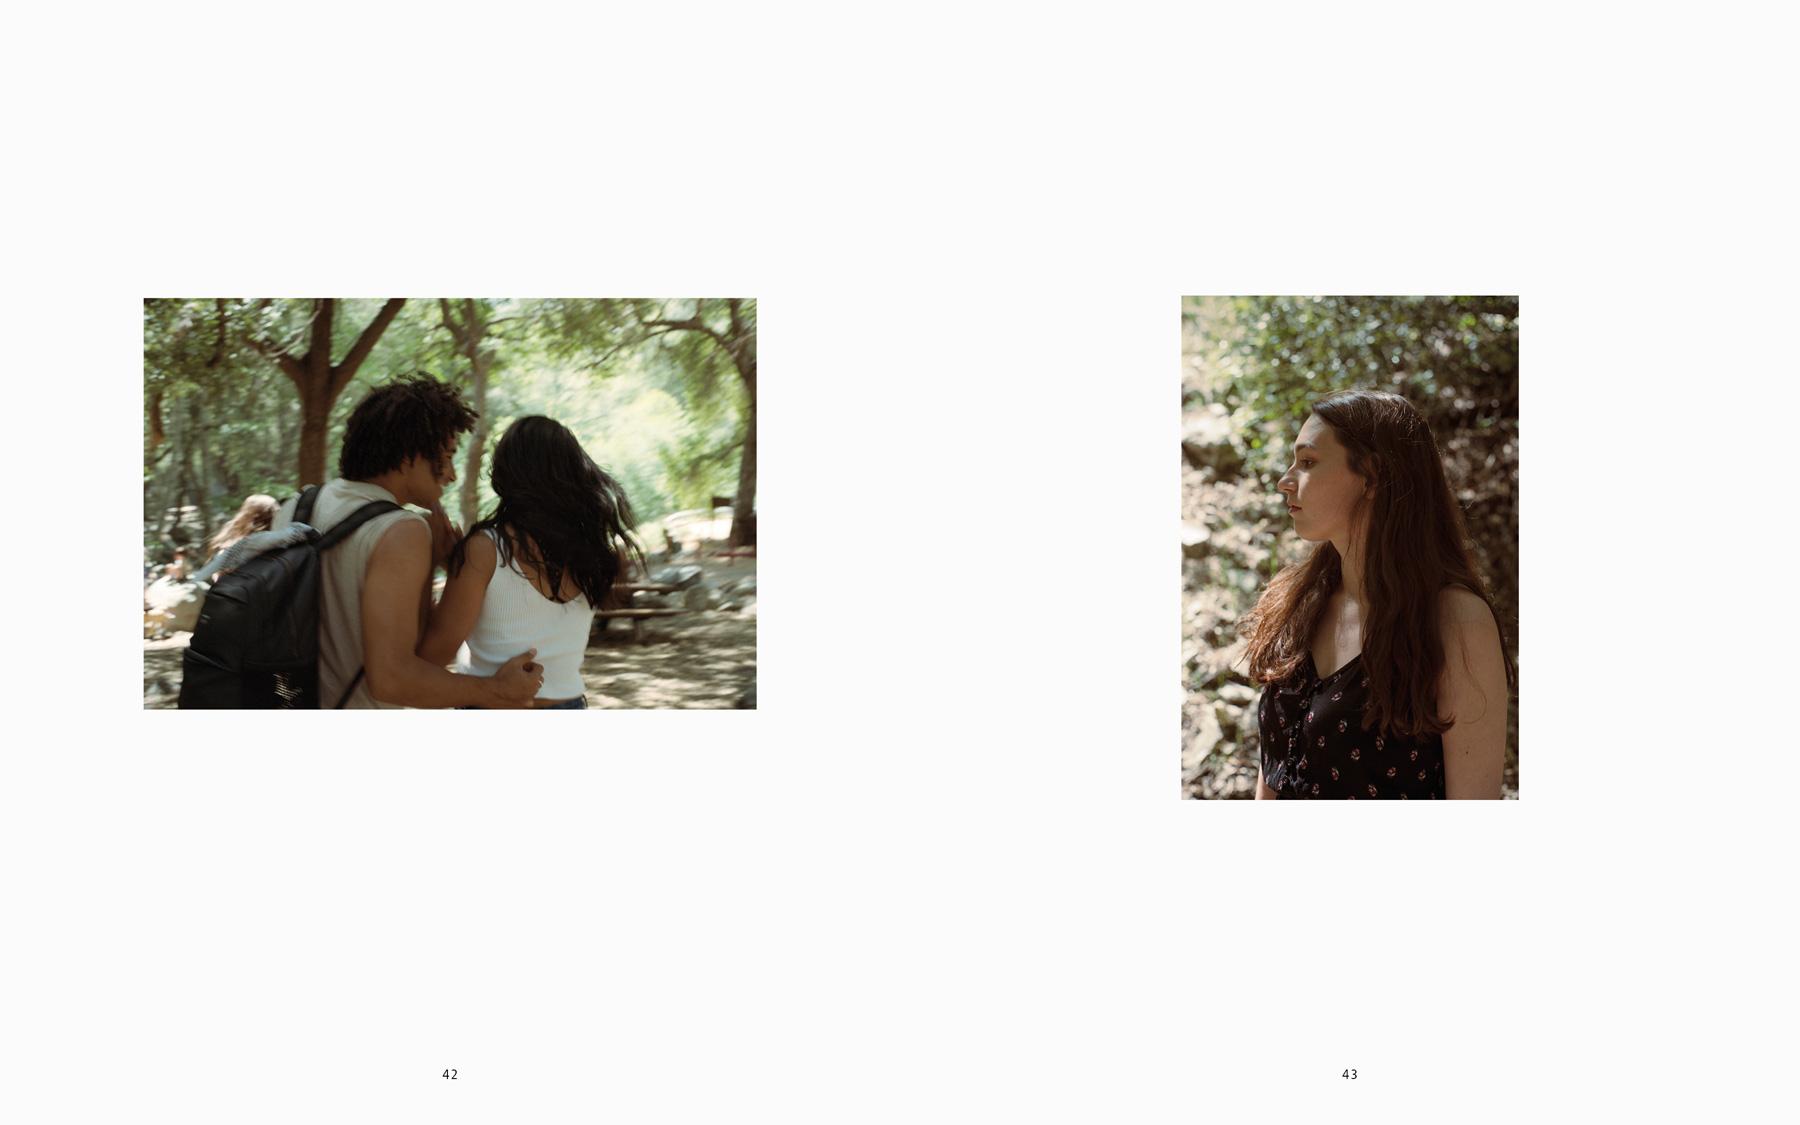 The Road To Switzer Falls, Photography By Ioannis Koussertari 5 friends journey to Switzer Falls California, featuring Shayne Davis, Devin Way, Brandon Win, Nemesis Ruiz, Kristen Kimmel.